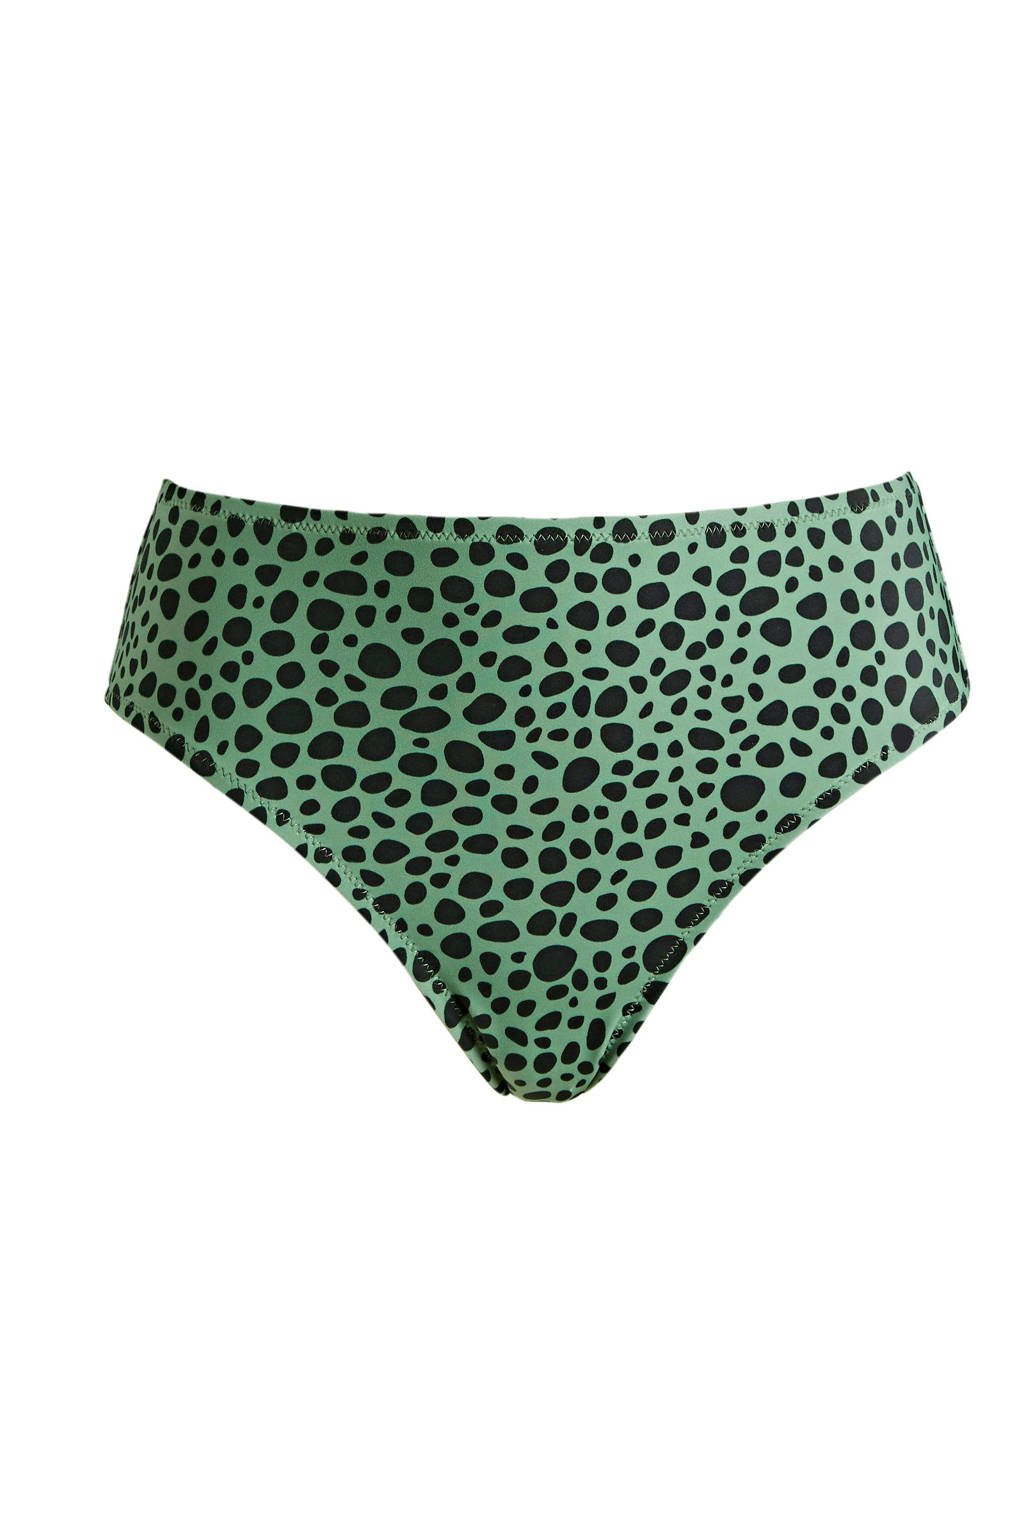 BEACHWAVE hipster bikinibroekje met stippen groen/zwart, Groen/zwart